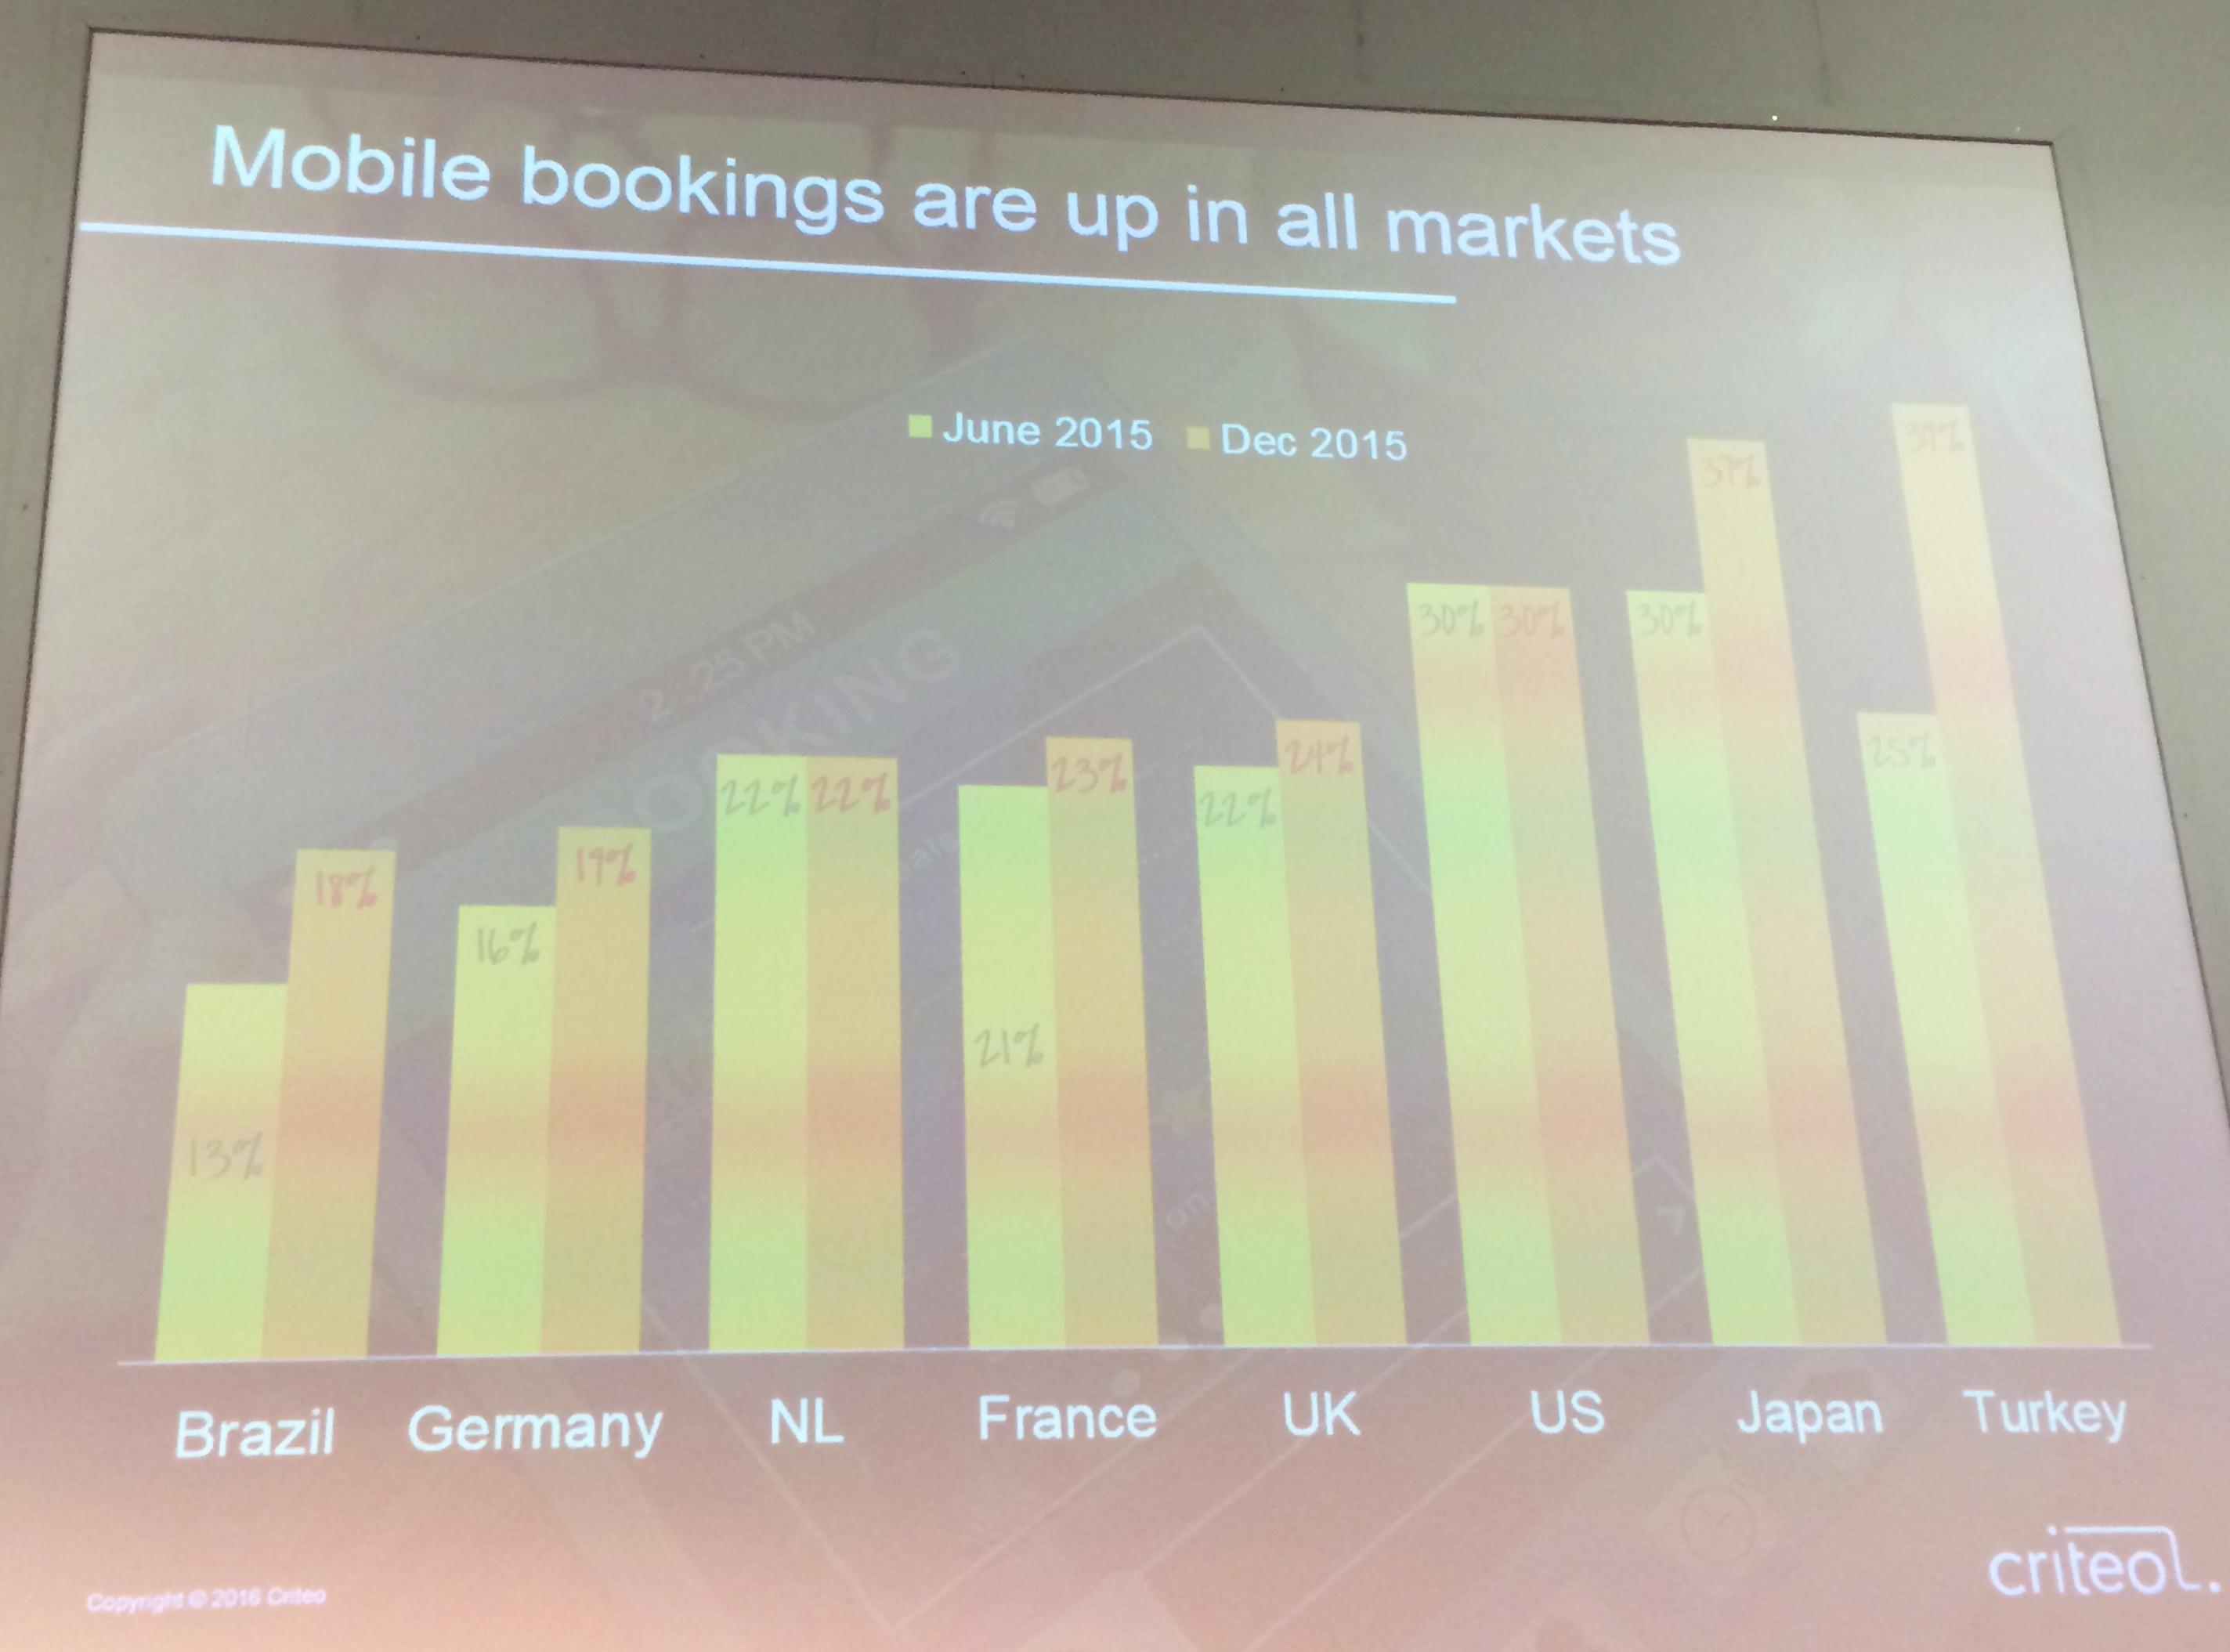 Steigende Mobile-Buchungen in allen Märkten